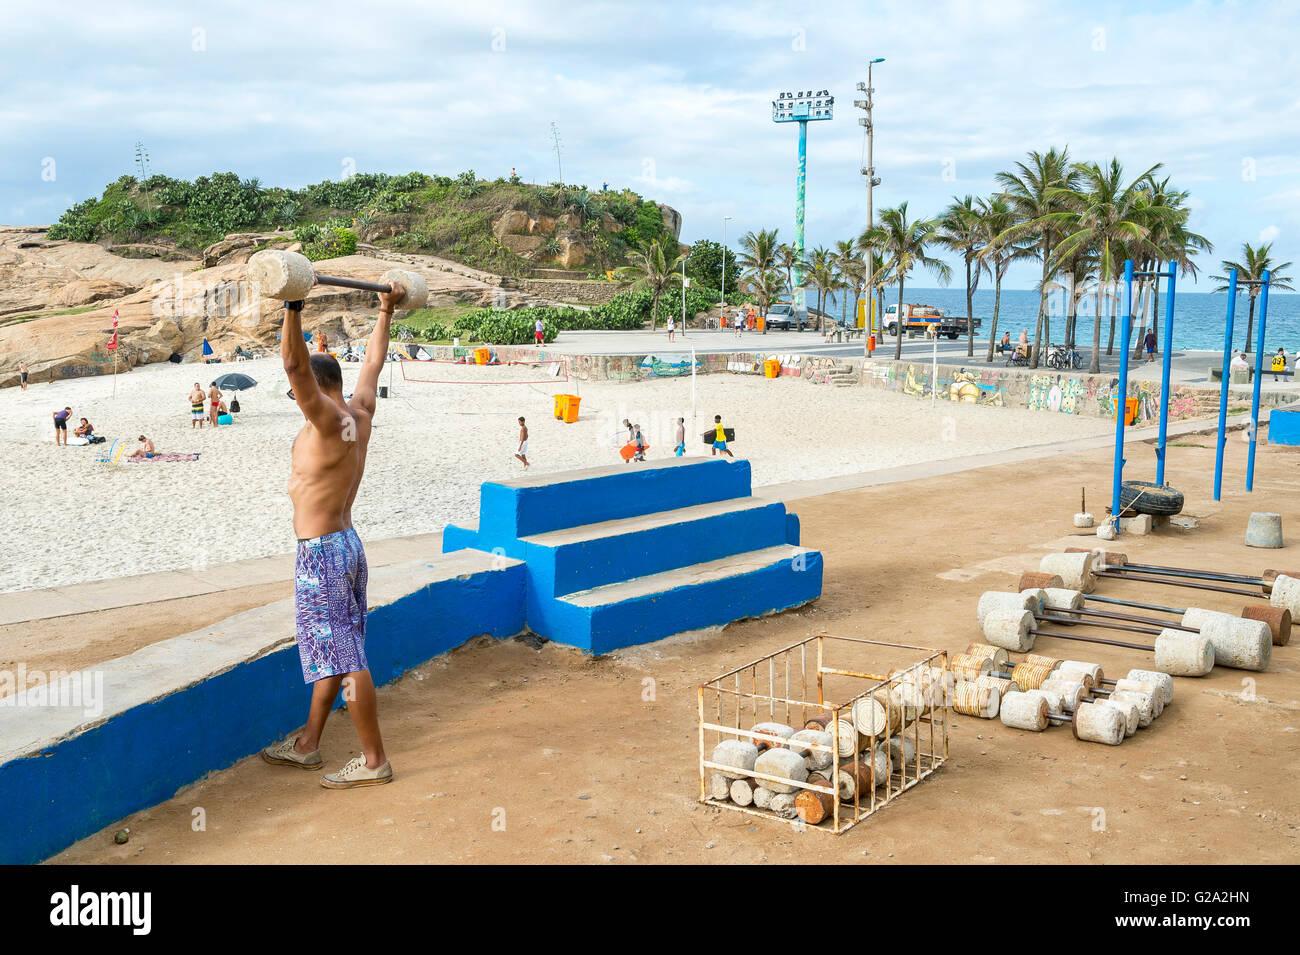 RIO DE JANEIRO - FEBRUARY 12, 2015: Brazilian man exercises at the outdoor workout station at Arpoador, the rock - Stock Image